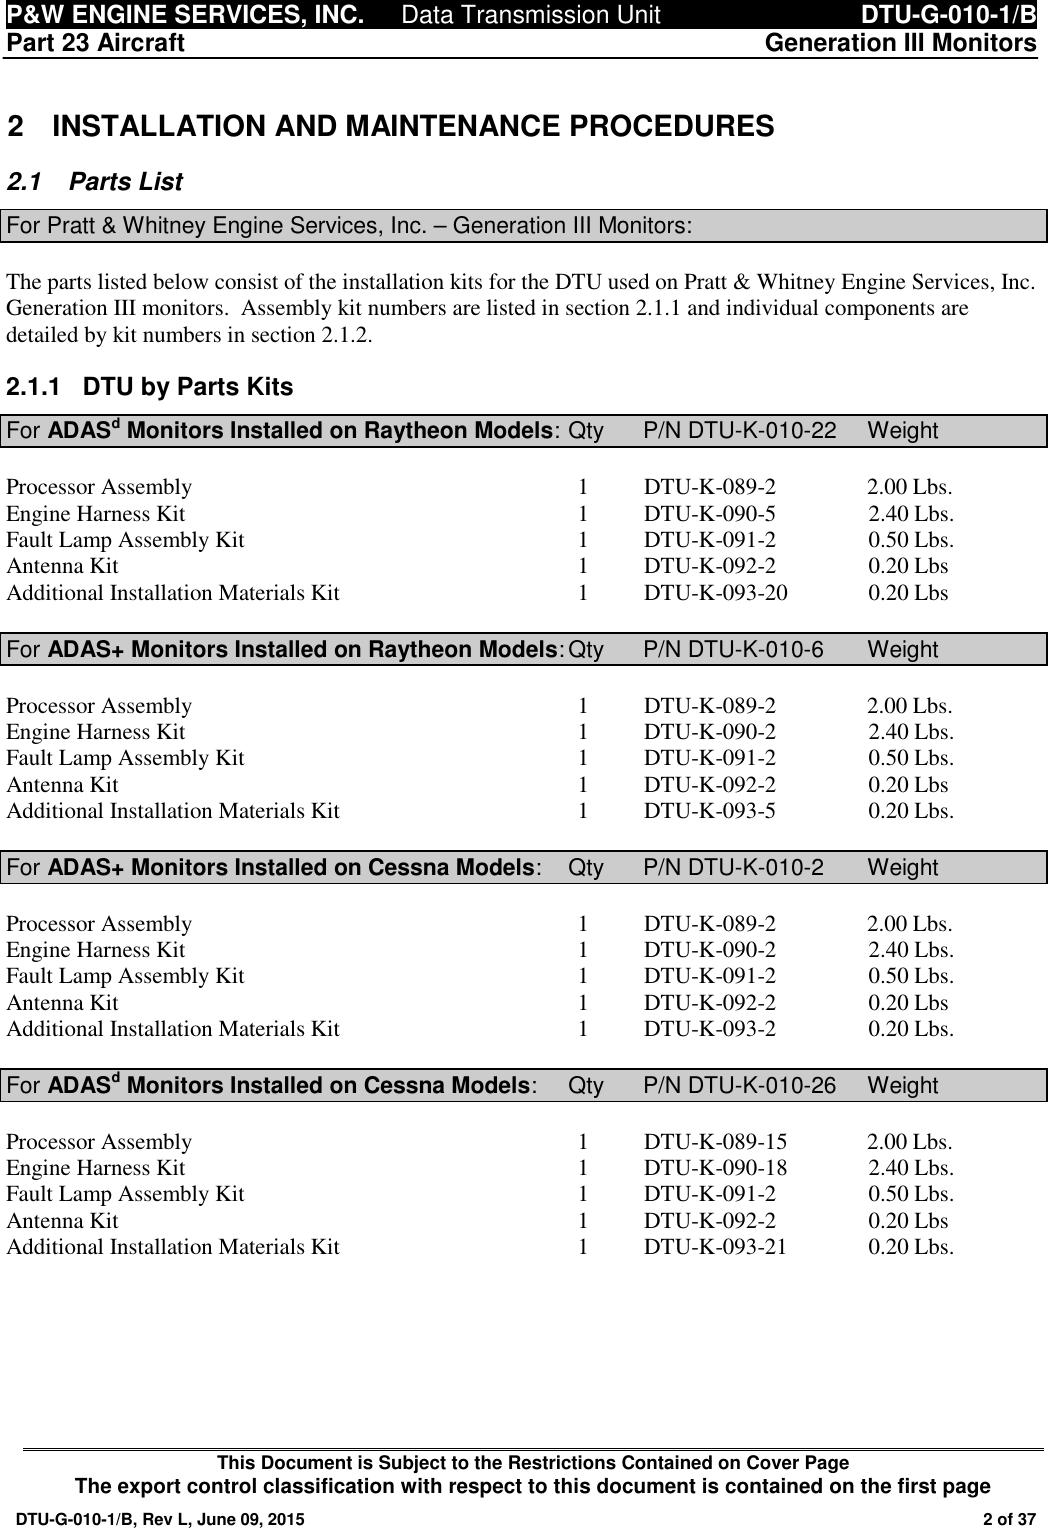 Engine 5 user manuals array pratt and whitney engine services fast34e engine flight data rh usermanual wiki fandeluxe Gallery